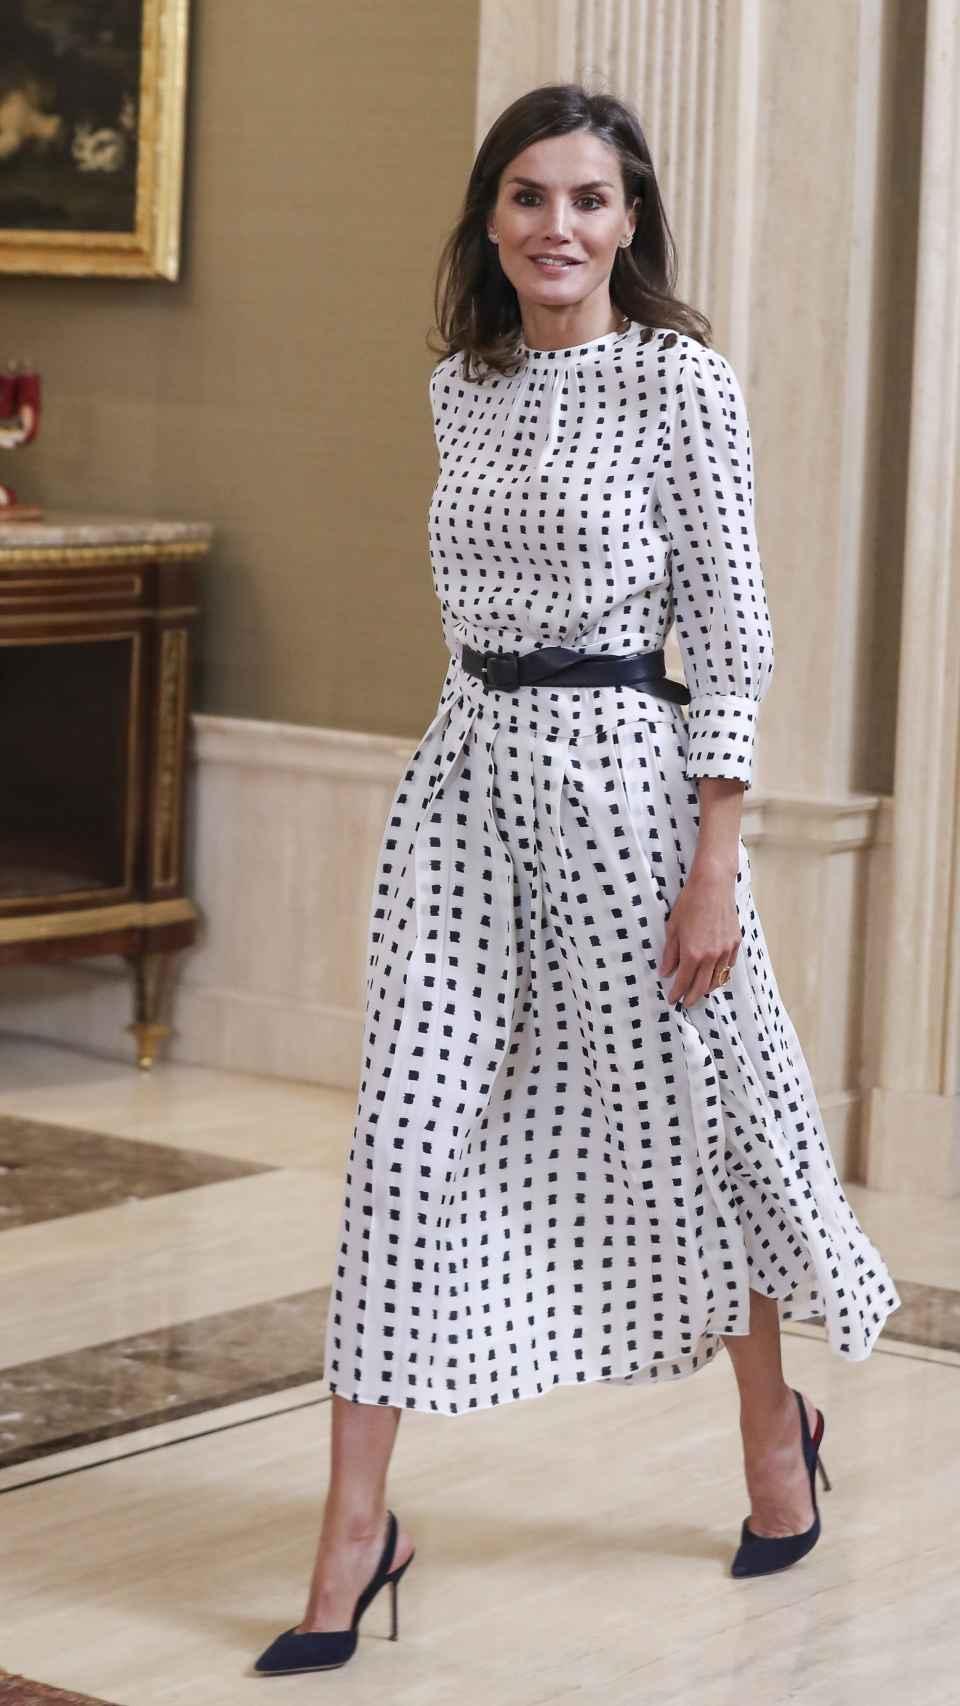 Letizia ha vuelto a lucir el vestido de Massimo Dutti en color blanco con lunares negros.